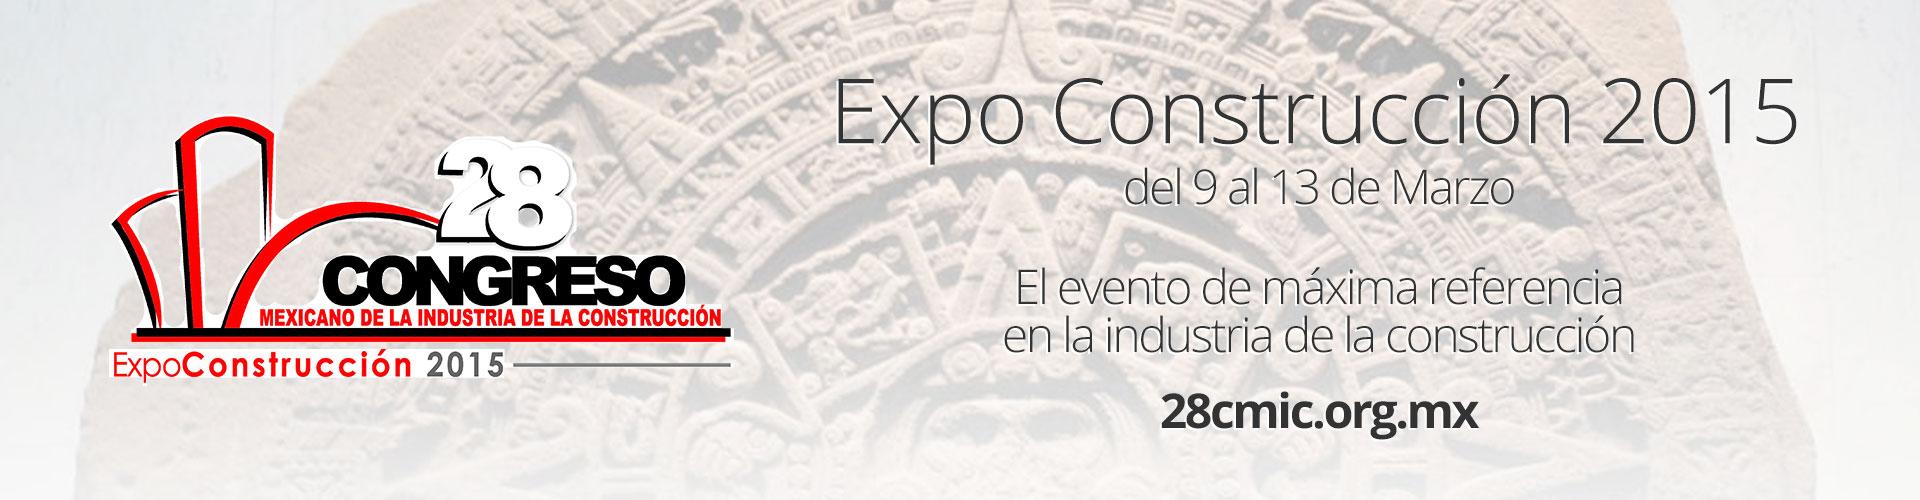 Expo Construcción 2015